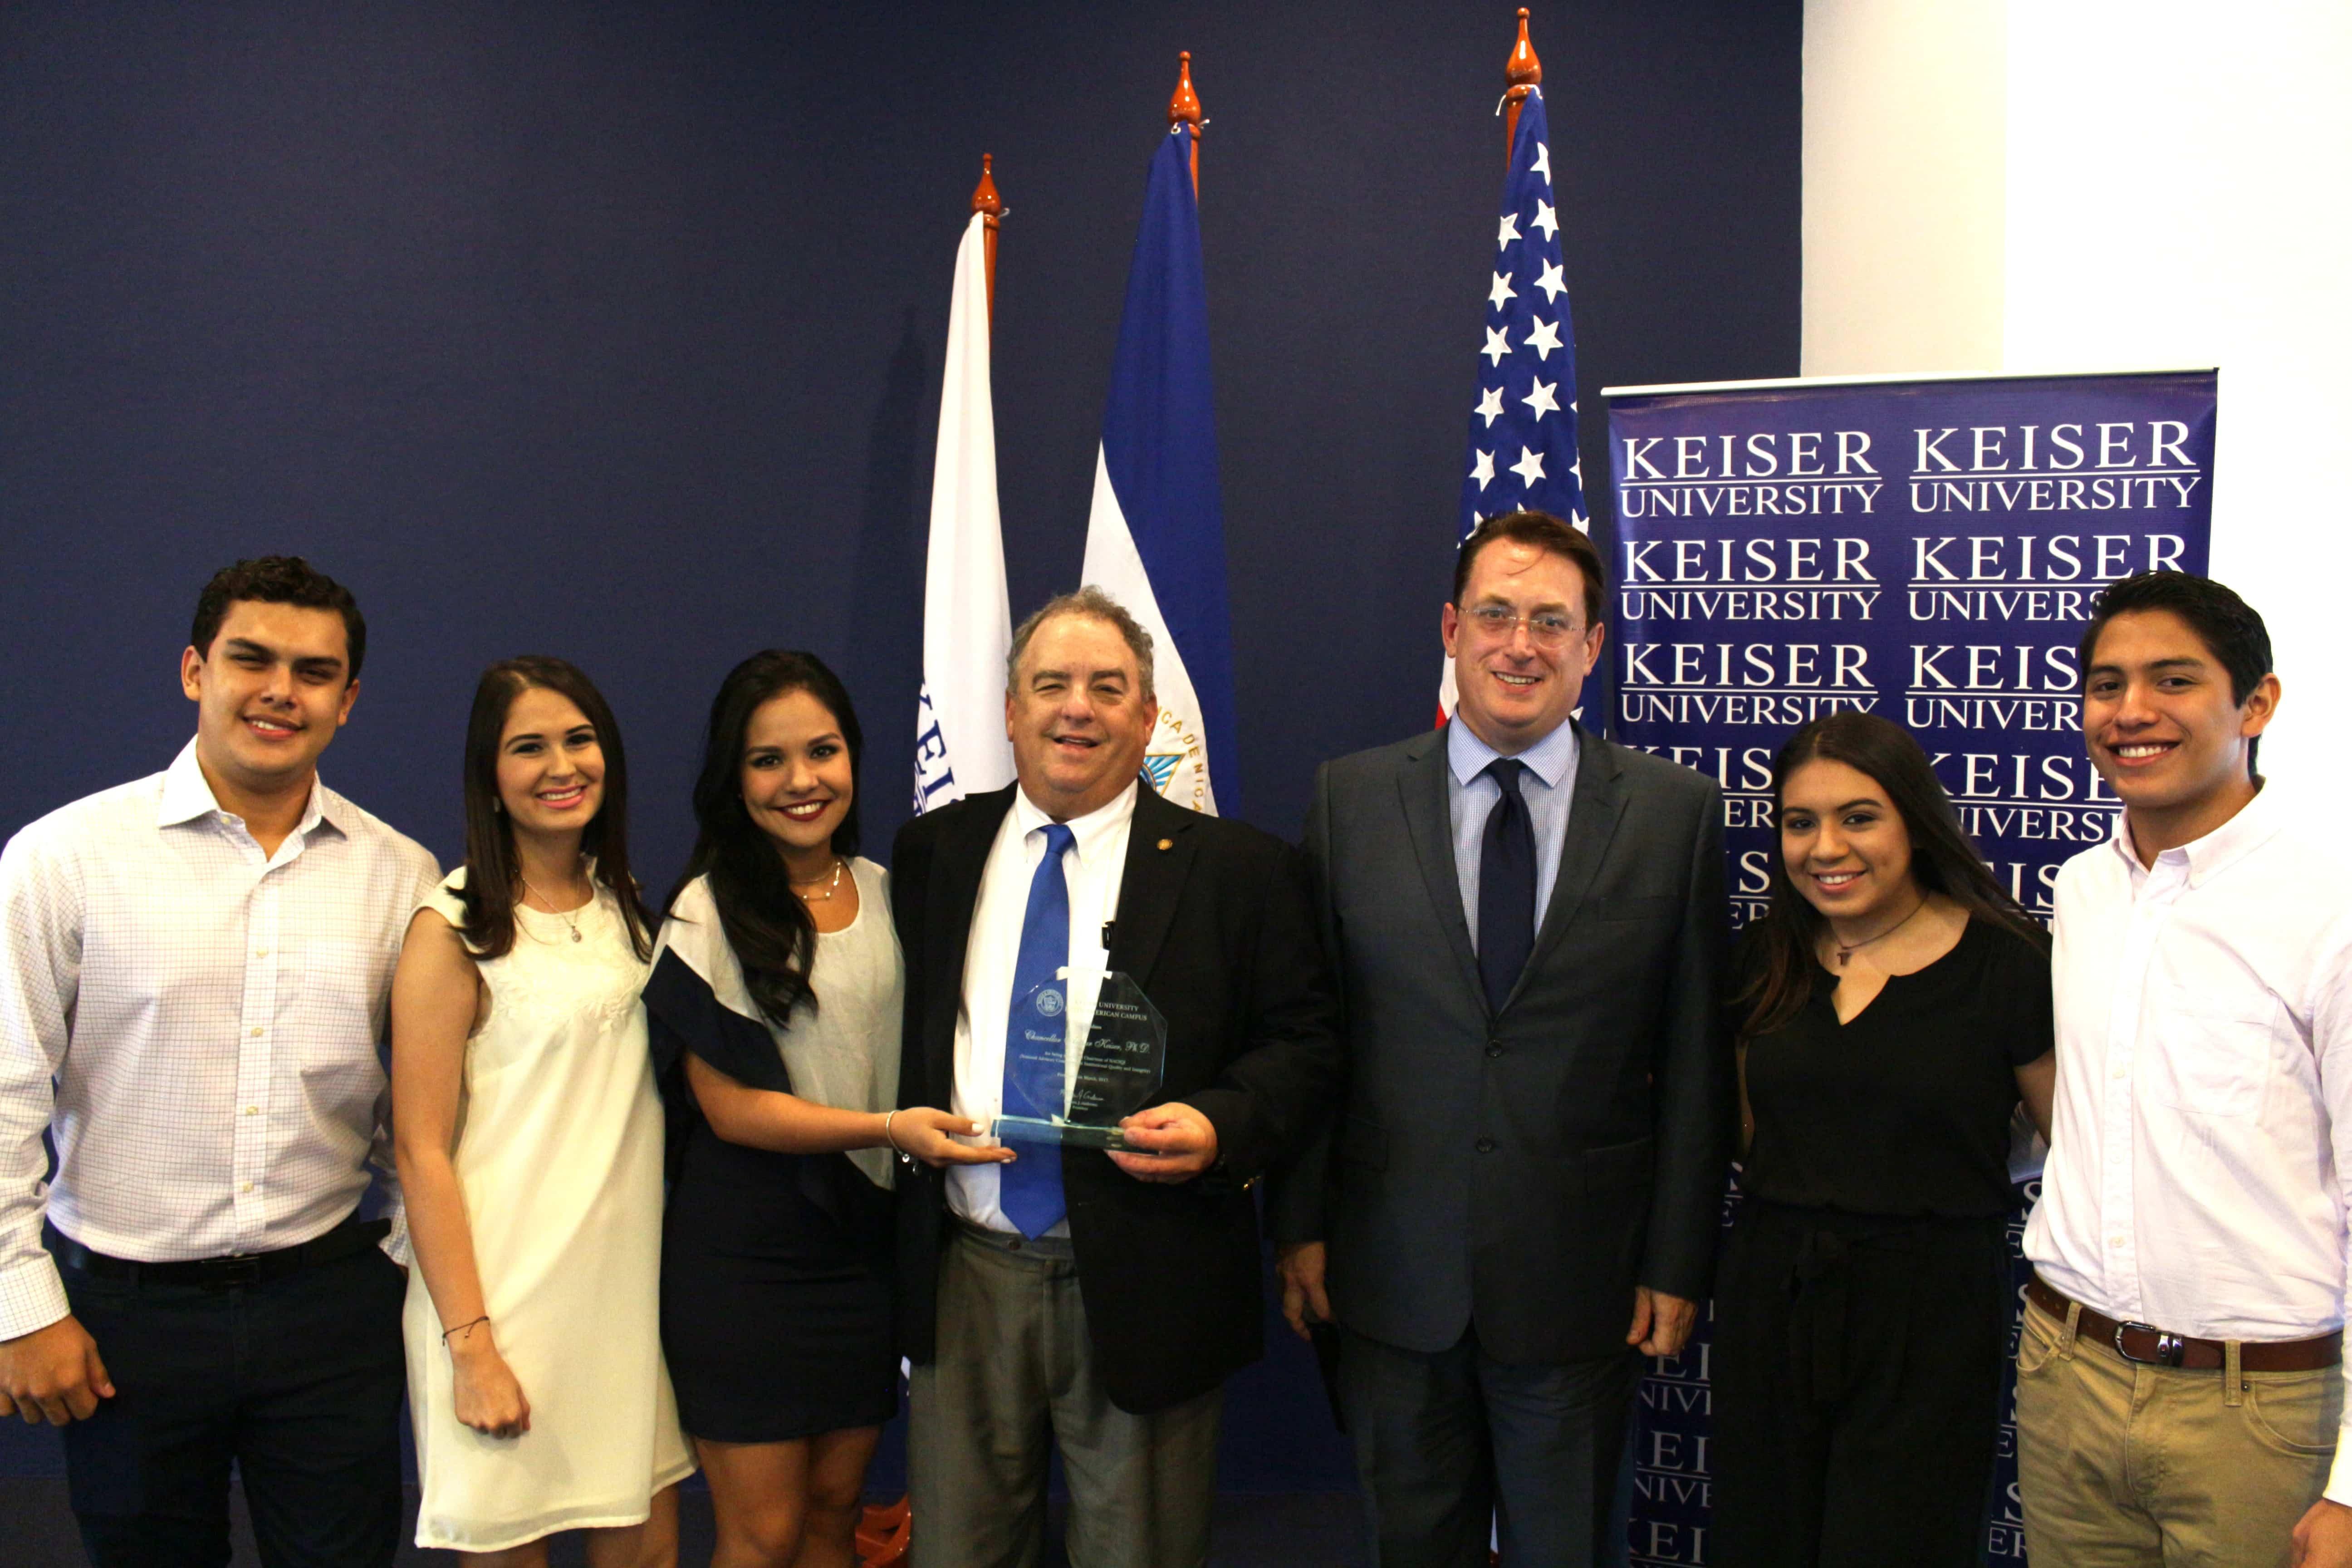 Latin American Students Honor Dr. Keiser